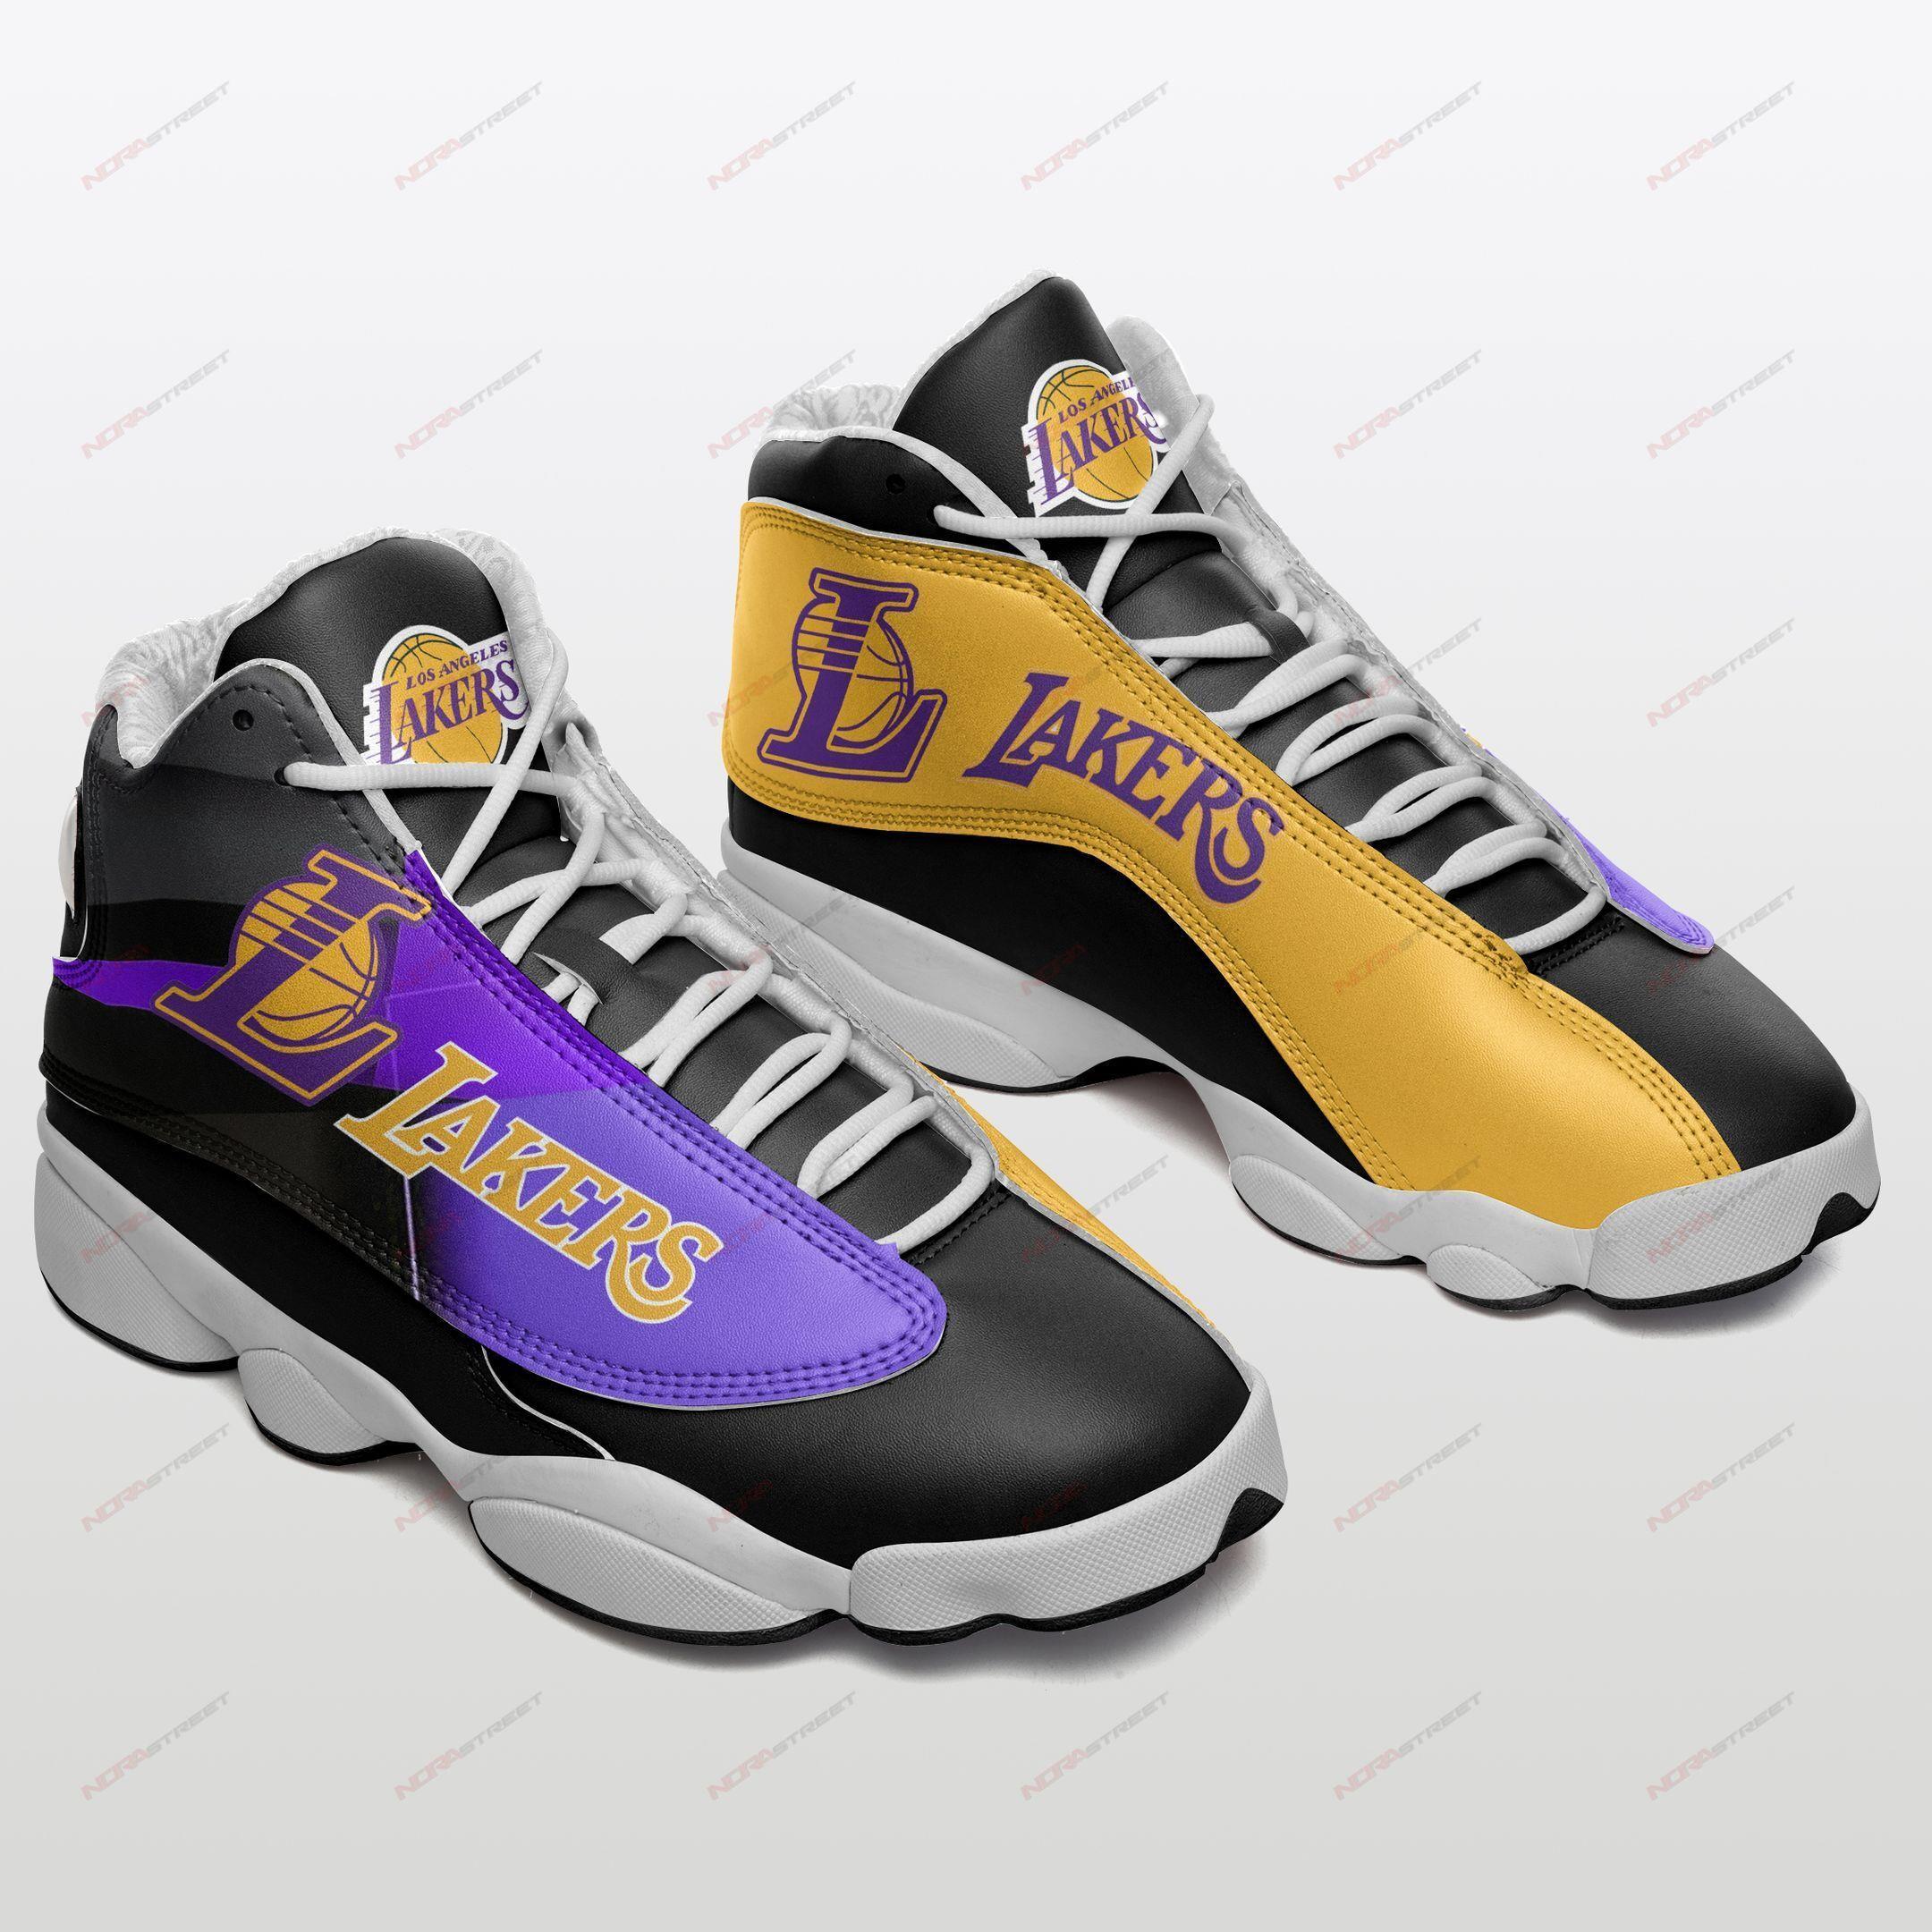 Los Angeles Lakers Air Jordan 13 Sneakers Sport Shoes Plus Size